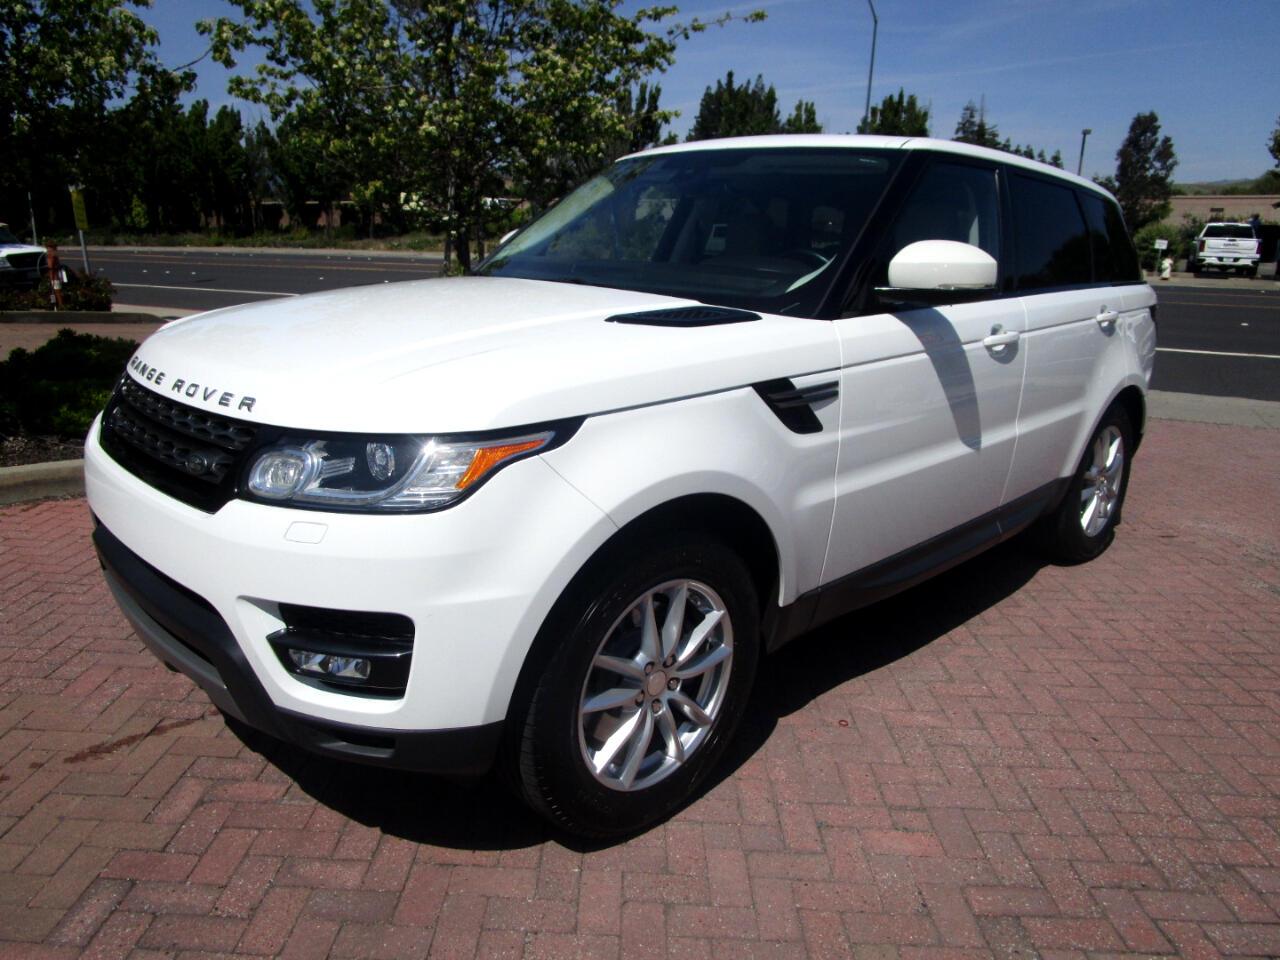 2014 Land Rover Range Rover Sport SE PKG*CLIMATE-COMFORT-VISIBILITY PKG*F/R HEAT SEA